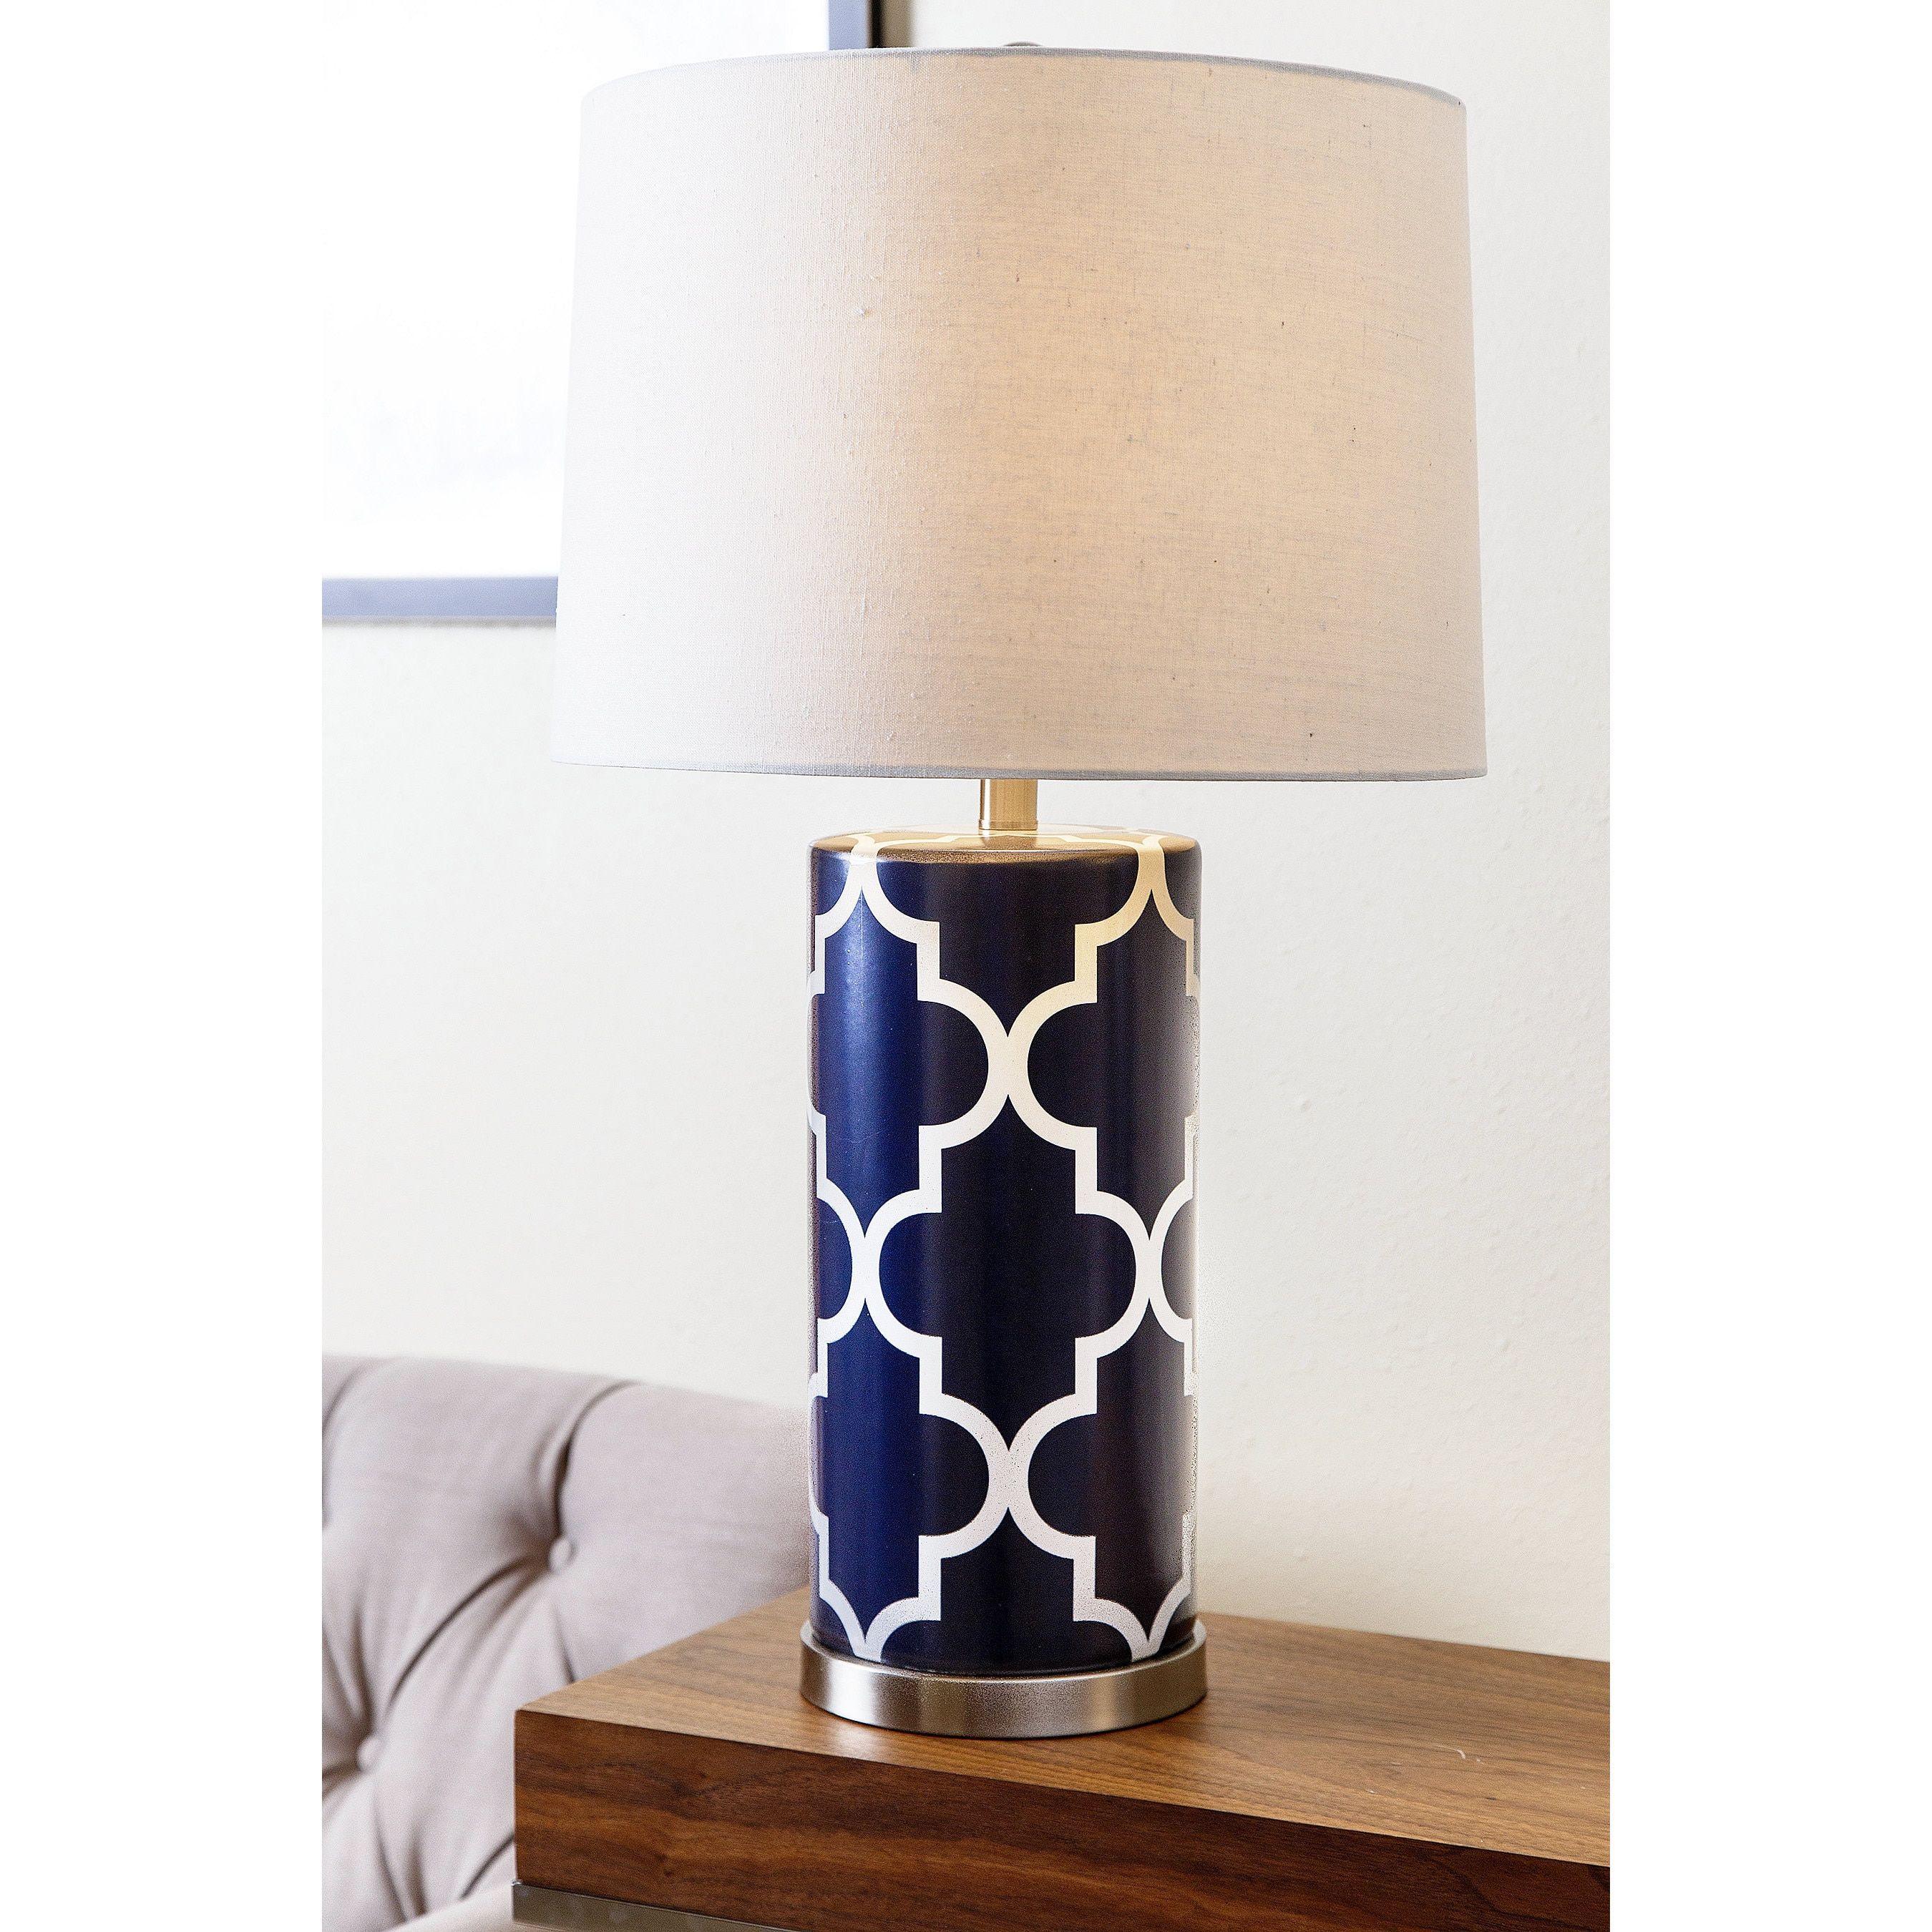 Abbyson Madison Navy Blue Lattice Table Lamp Blue Porcelain